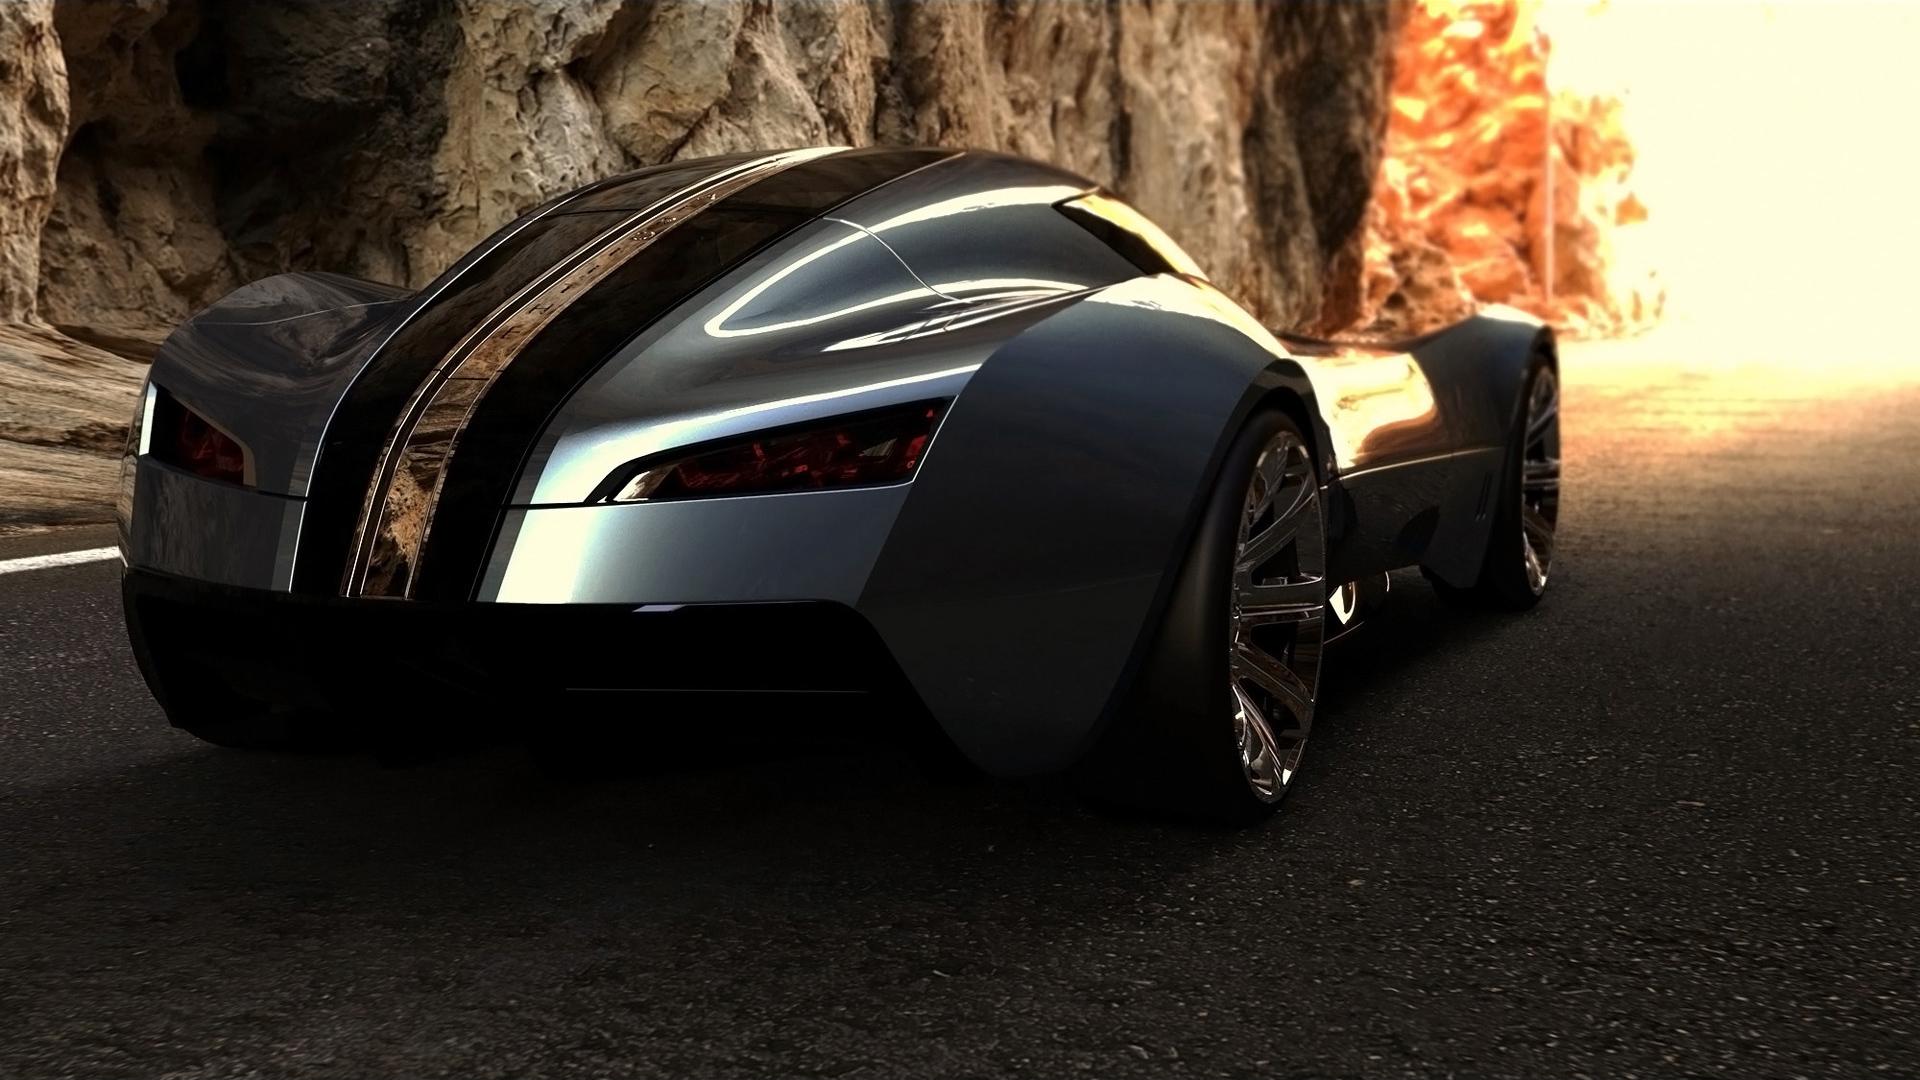 Bugatti aerolithe - photo#17